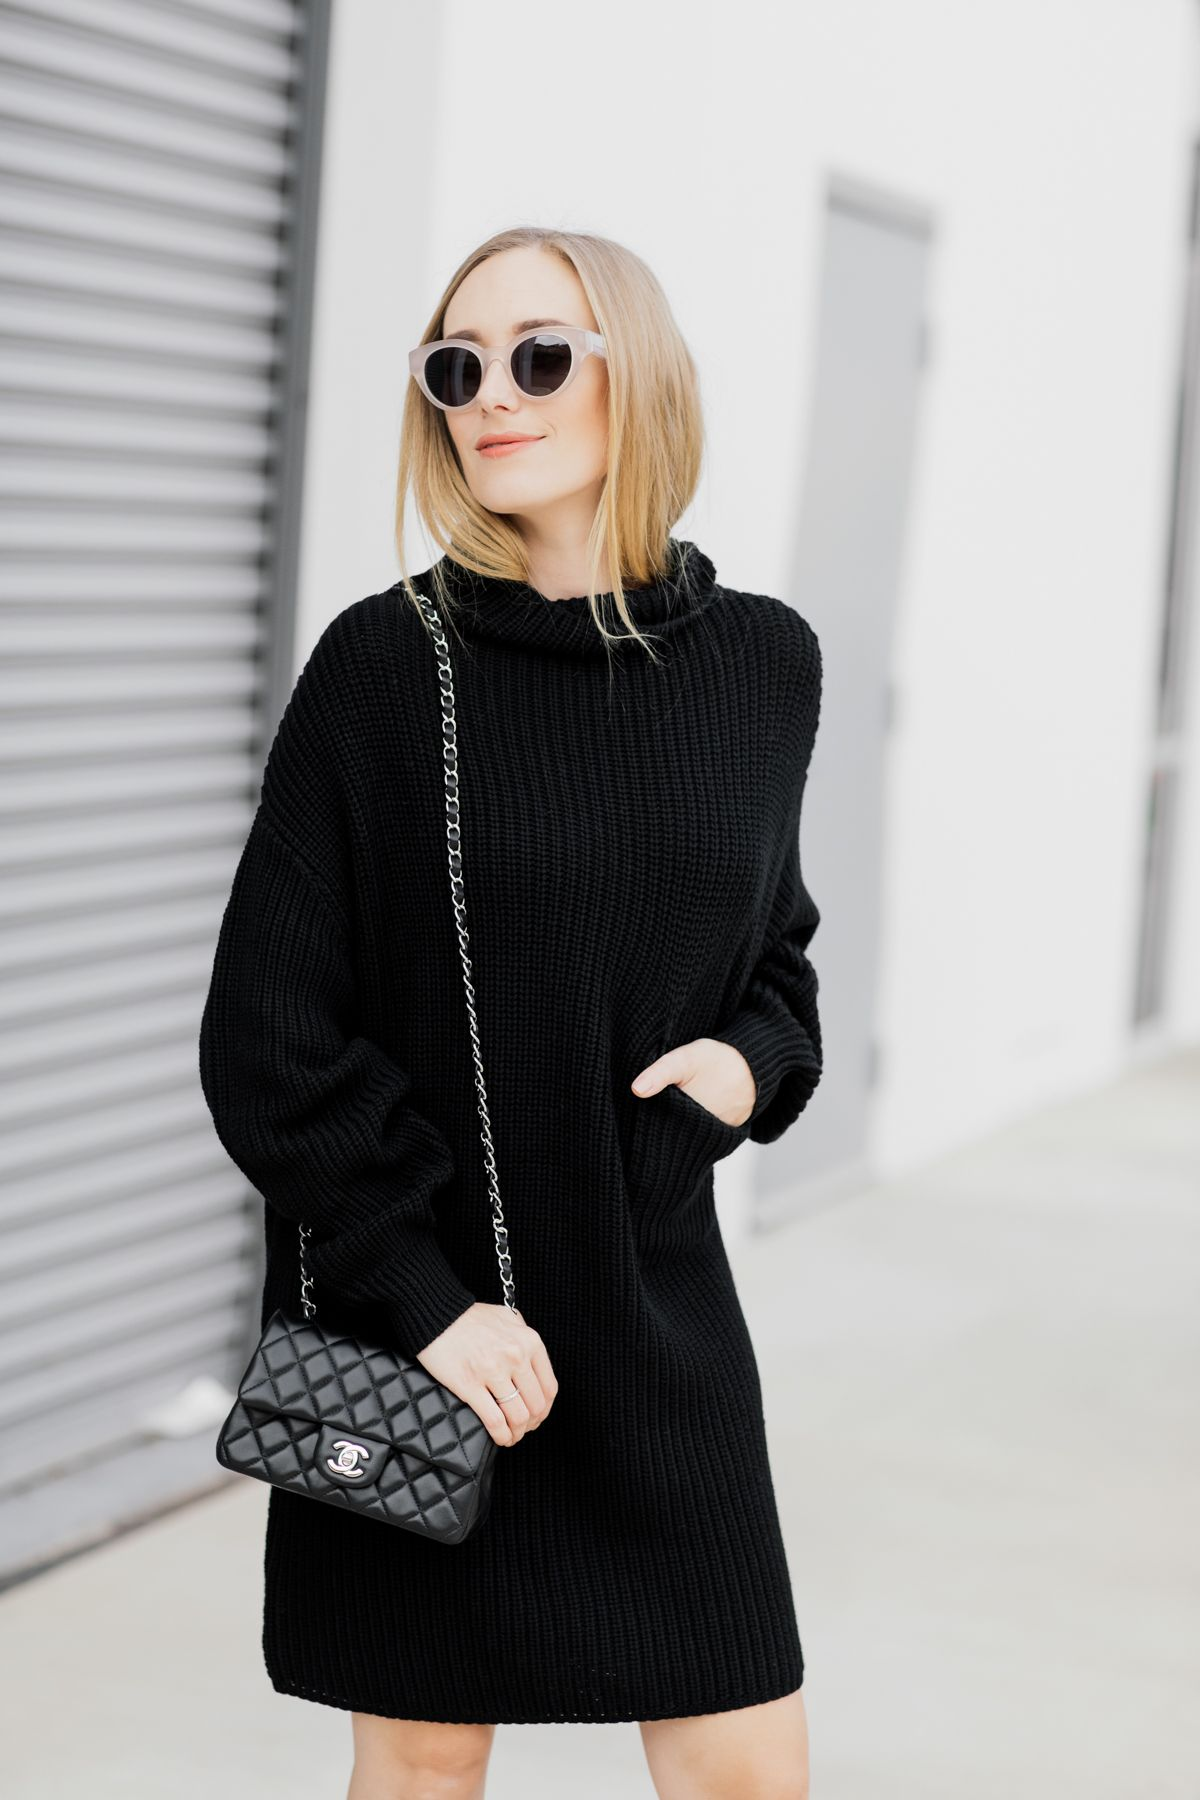 Perfect Black Knit Sweater Dress Black And White Style Personal Style Fashion Chanel Eatsleepw Black Knit Sweater Dress Fashion Sweater Dress [ 1800 x 1200 Pixel ]